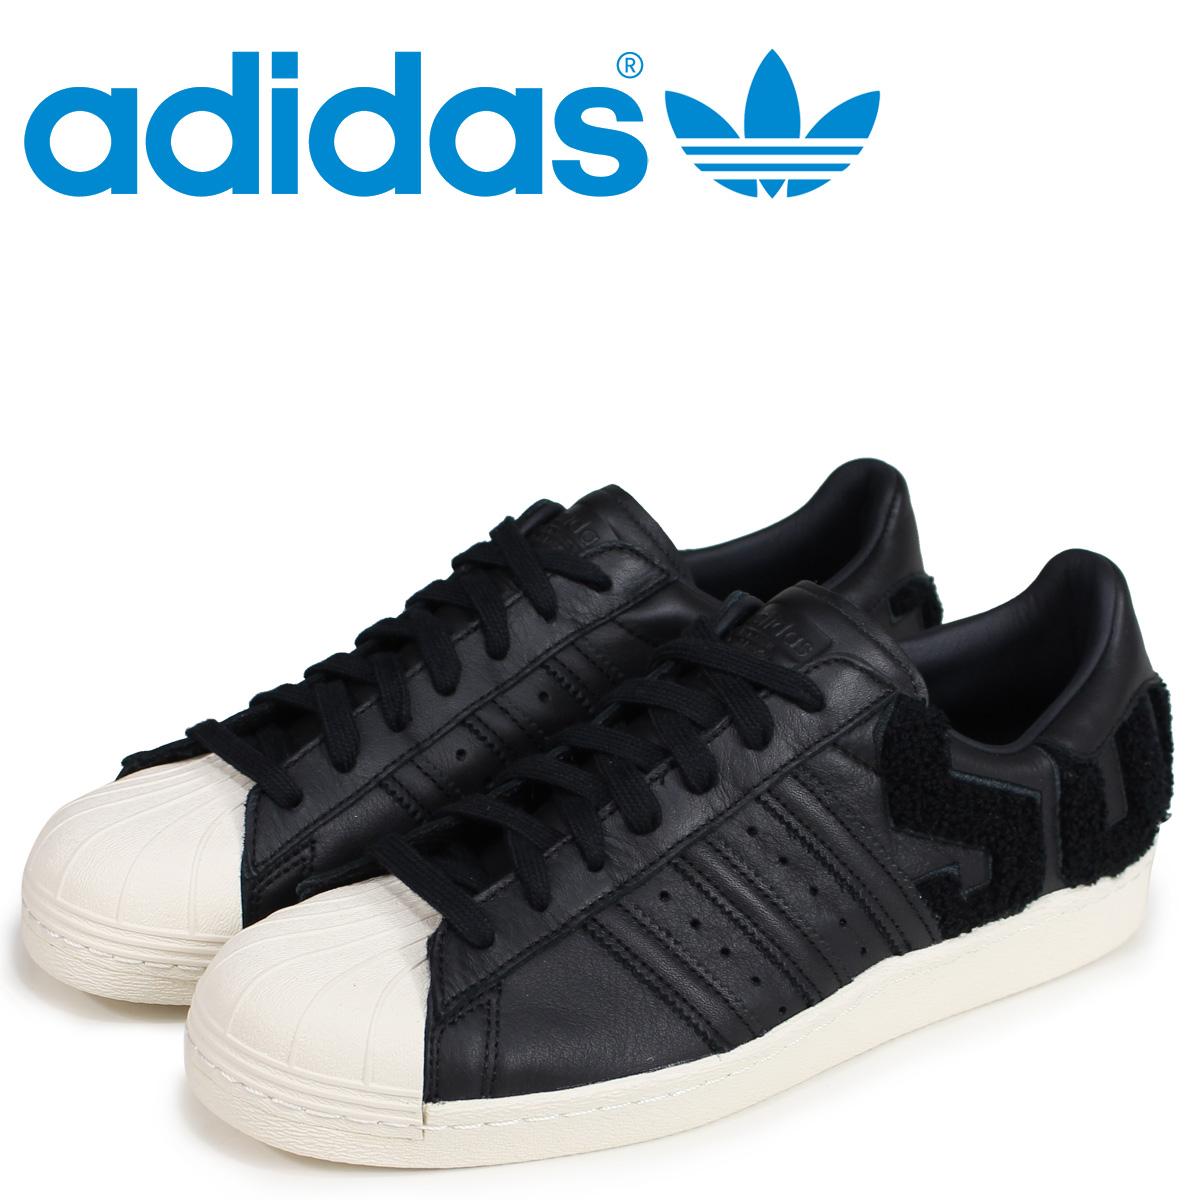 adidas Originals スーパースター アディダス オリジナルス スニーカー SUPERSTAR メンズ AQ0883 ブラック 黒